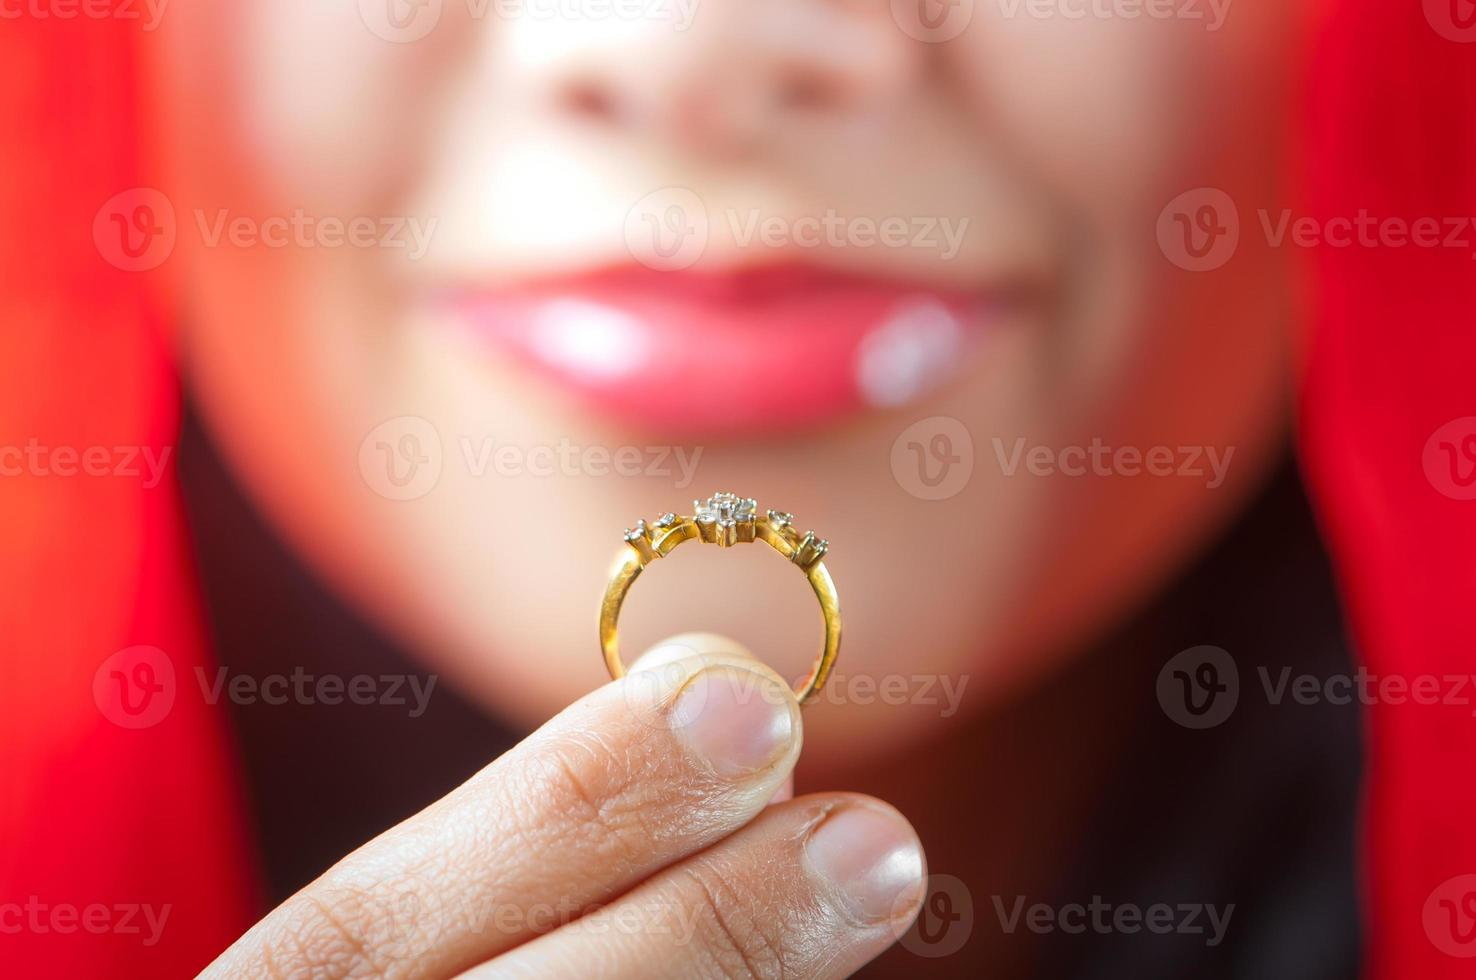 My wedding ring photo